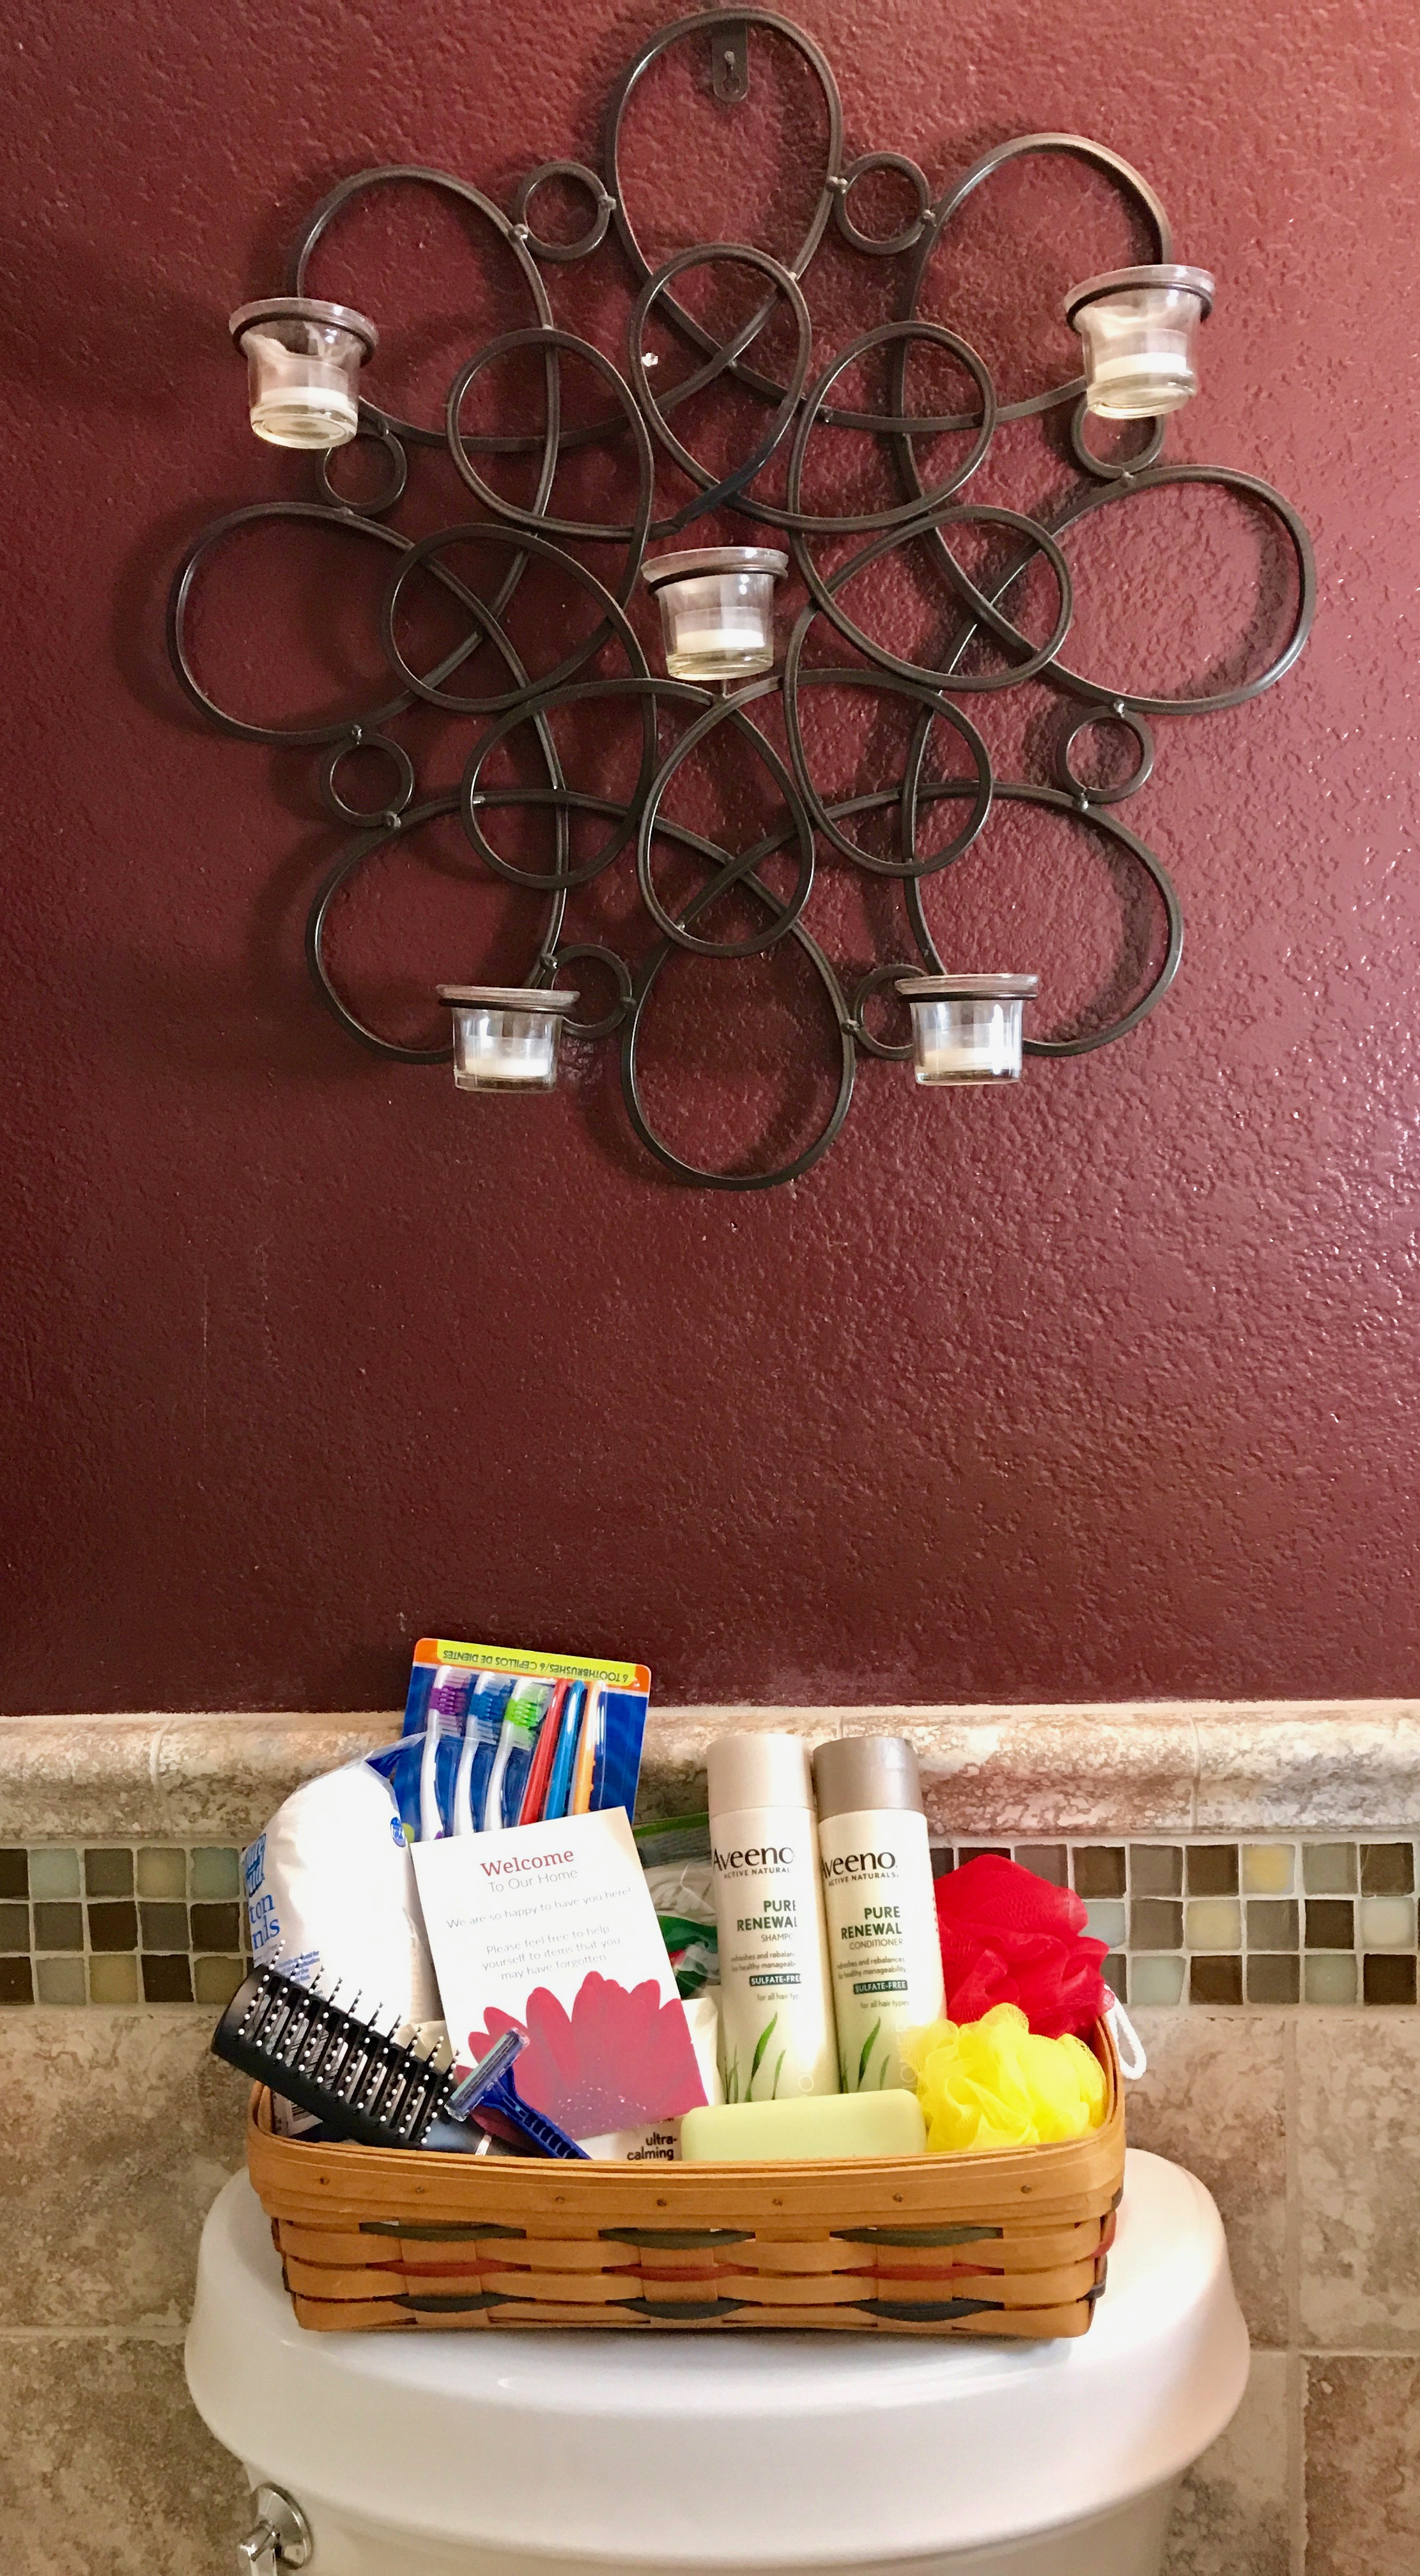 Welcome Guest Bathroom Basket